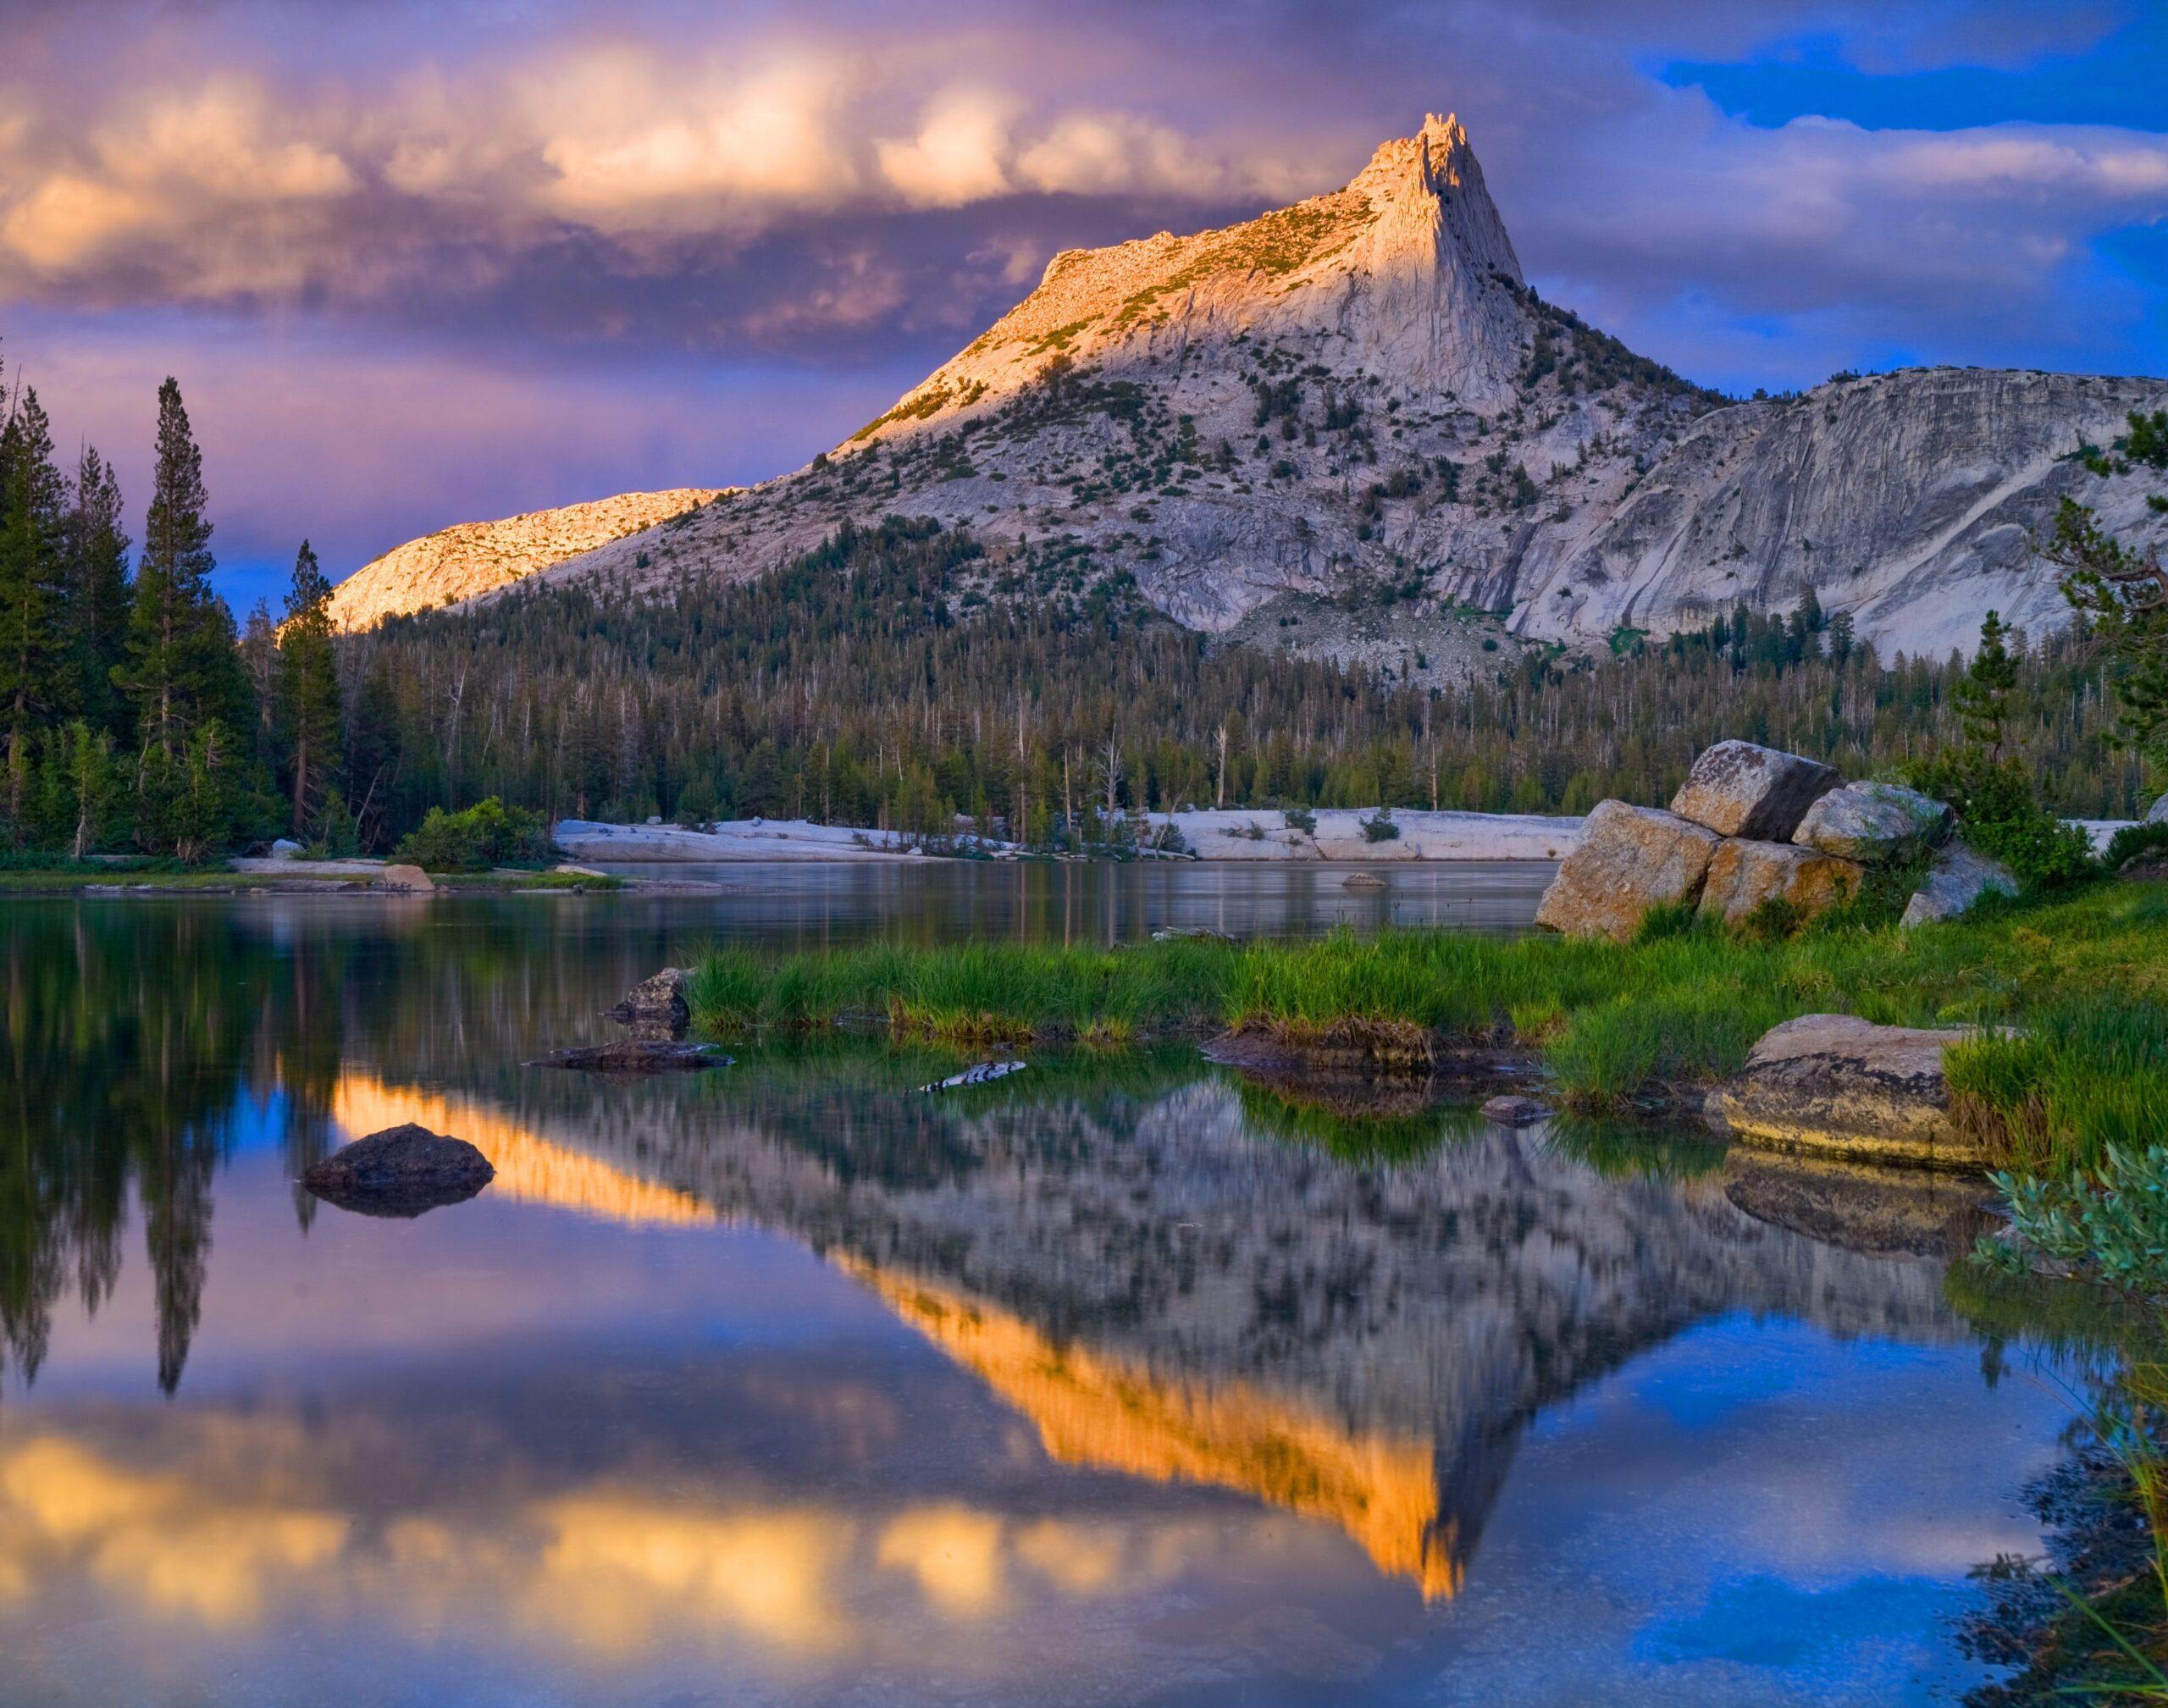 Cathedral Peak and Lake. Yosemite National Park.